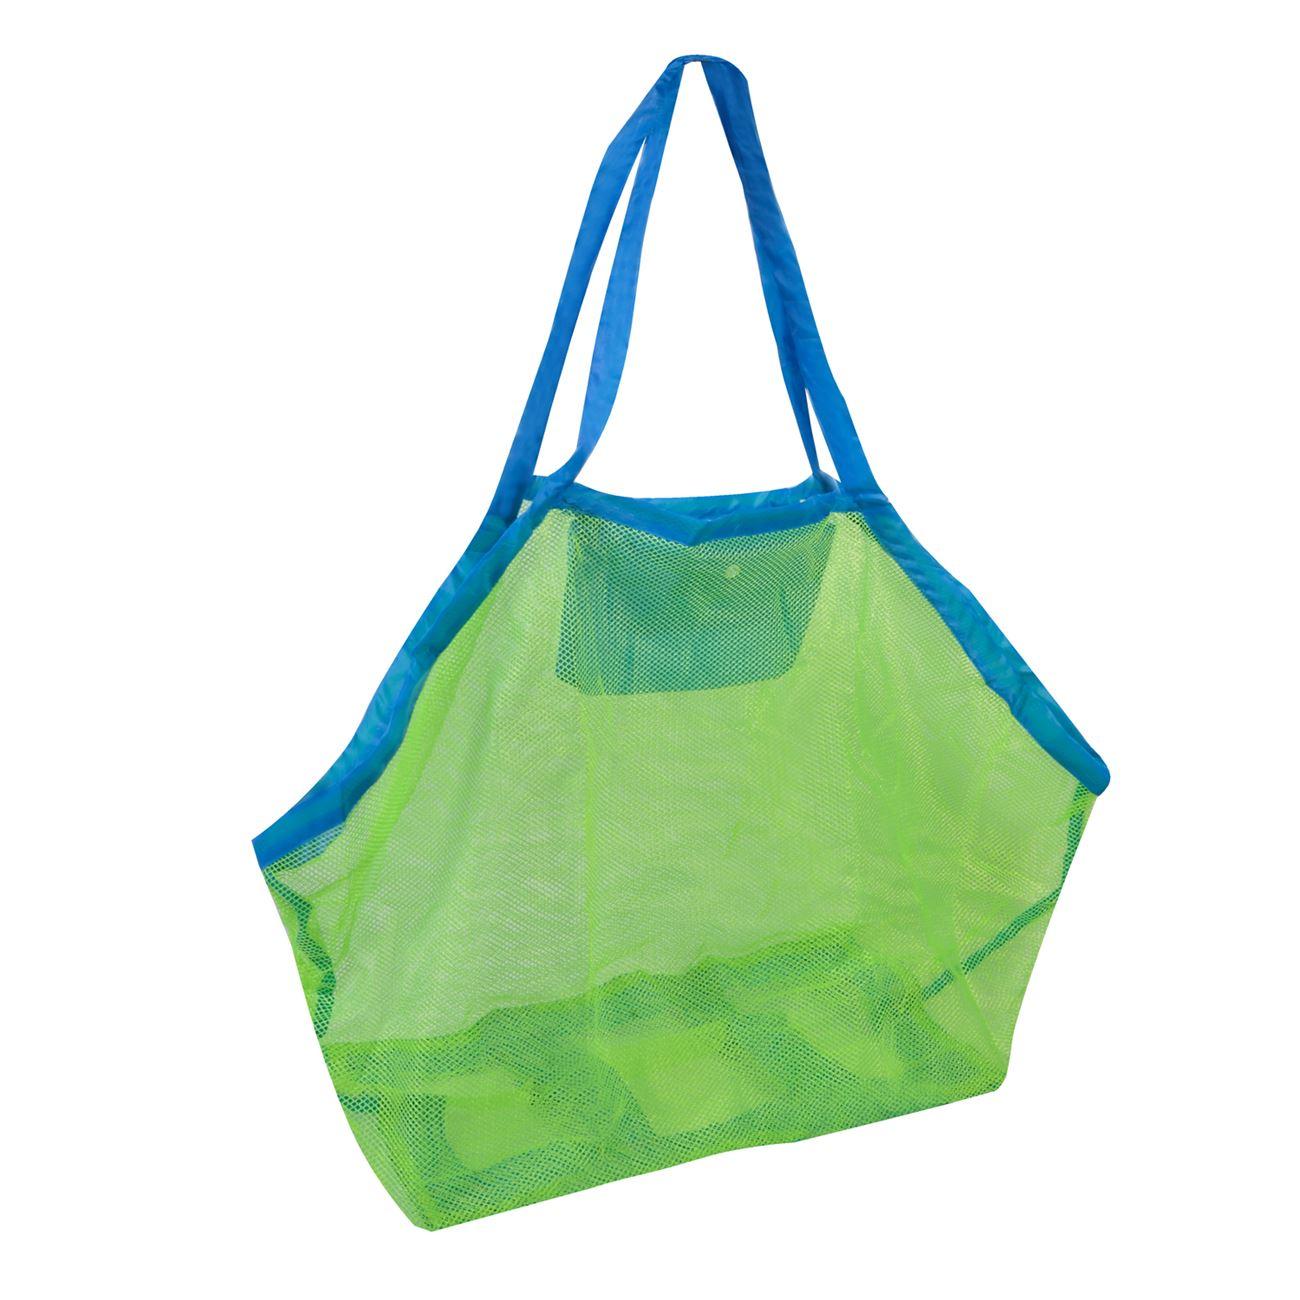 596f408092 Τσάντα με Δίχτυ Αναδιπλωμένη 45x30x45   Καλοκαιρινές Τσάντες Μεταφοράς Δίχτυ